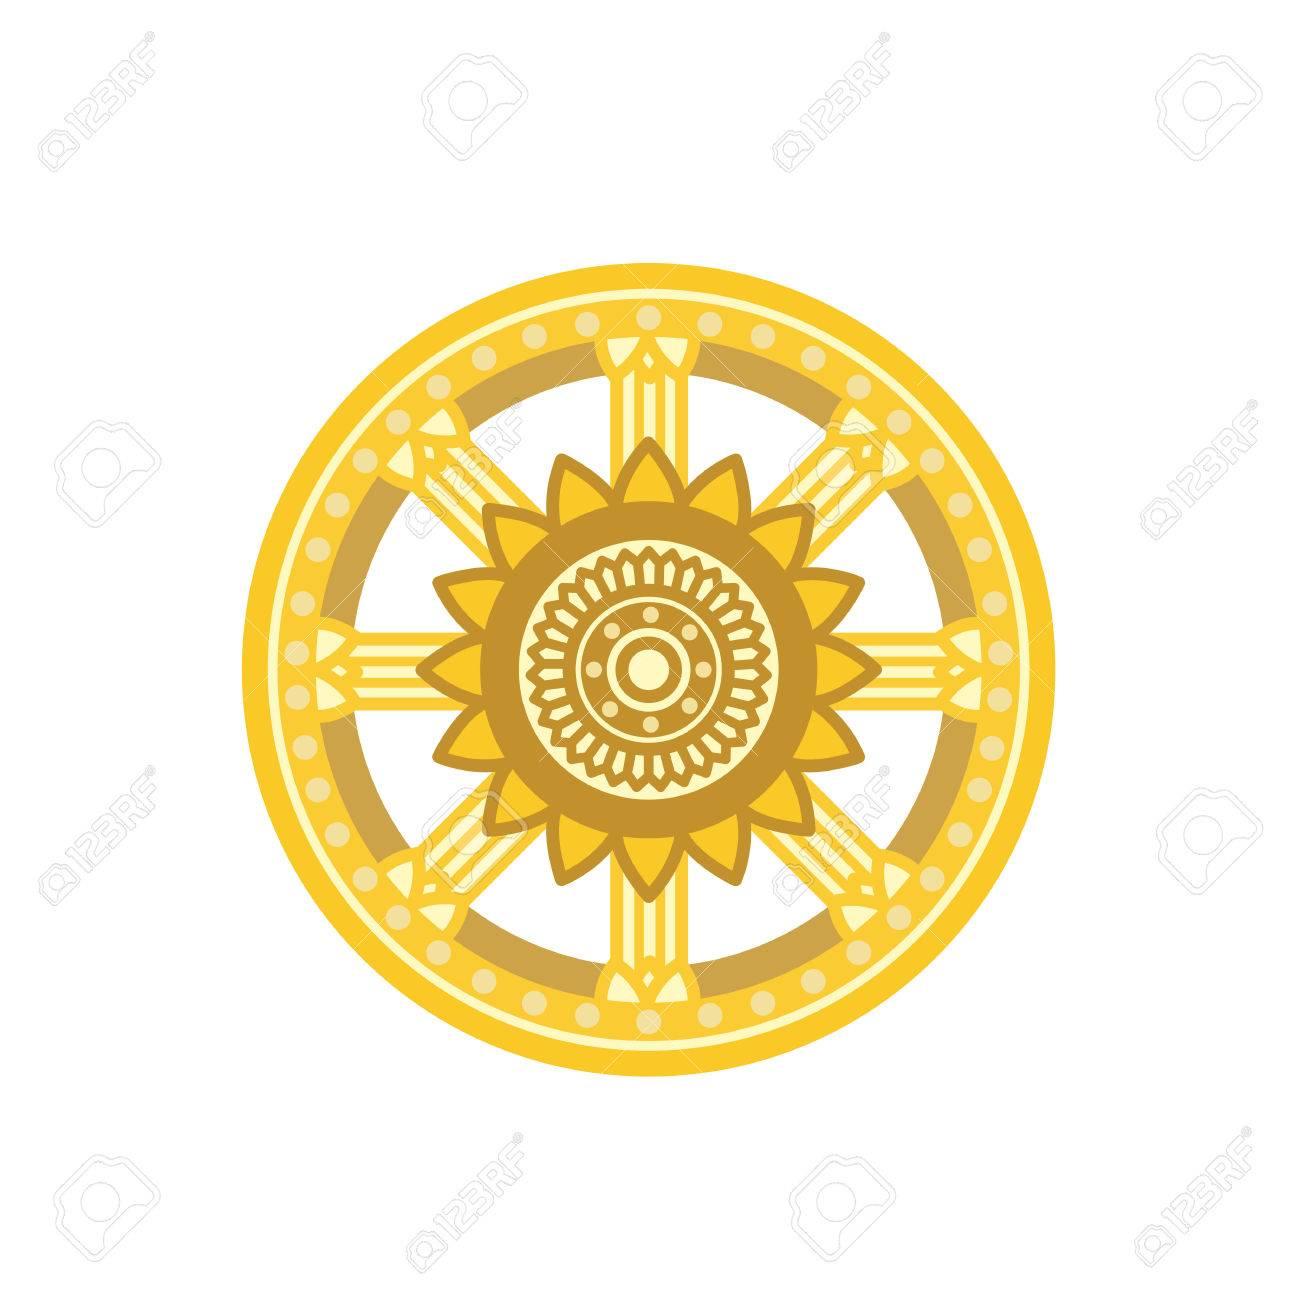 Dharma wheel dharmachakra icon buddhism symbol isolated on dharma wheel dharmachakra icon buddhism symbol isolated on white background stock vector buycottarizona Image collections